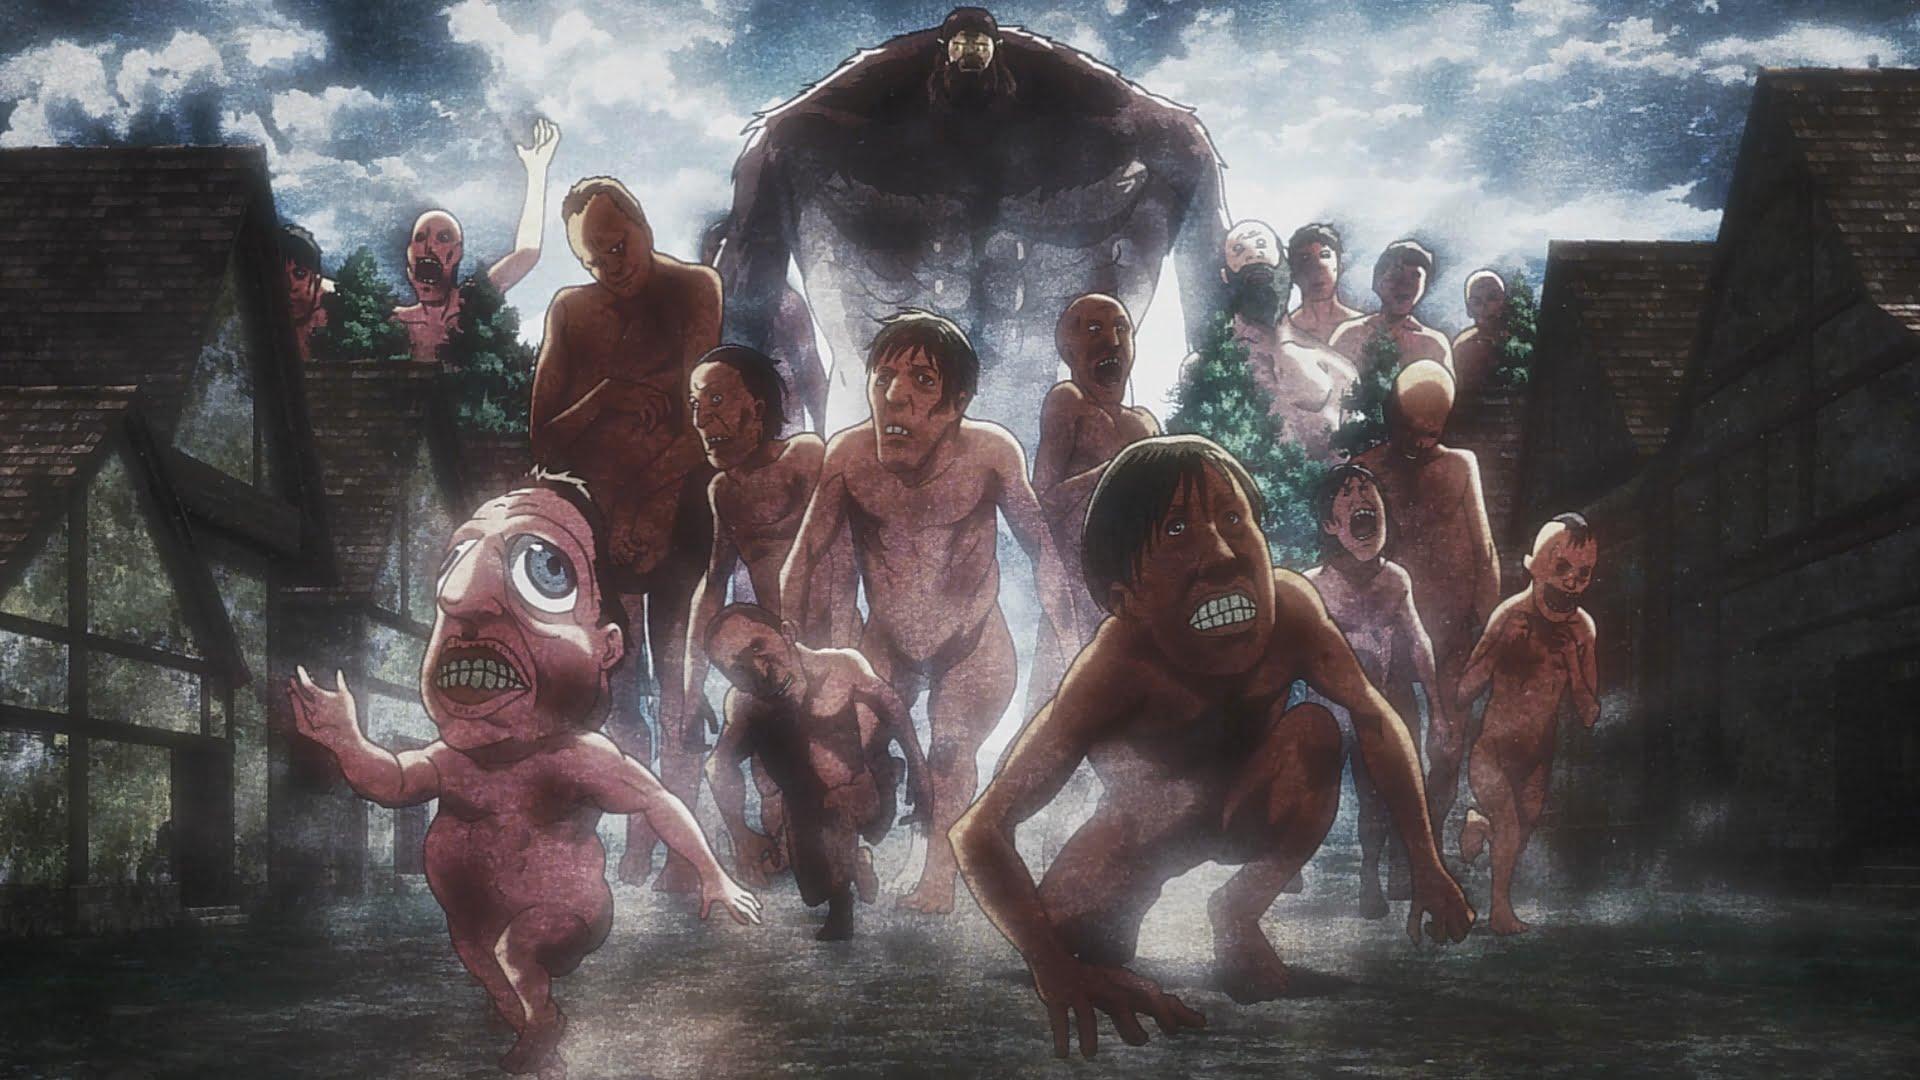 L'attacco Dei Giganti - Top 5 Personaggi Giganti 2 - Hynerd.it